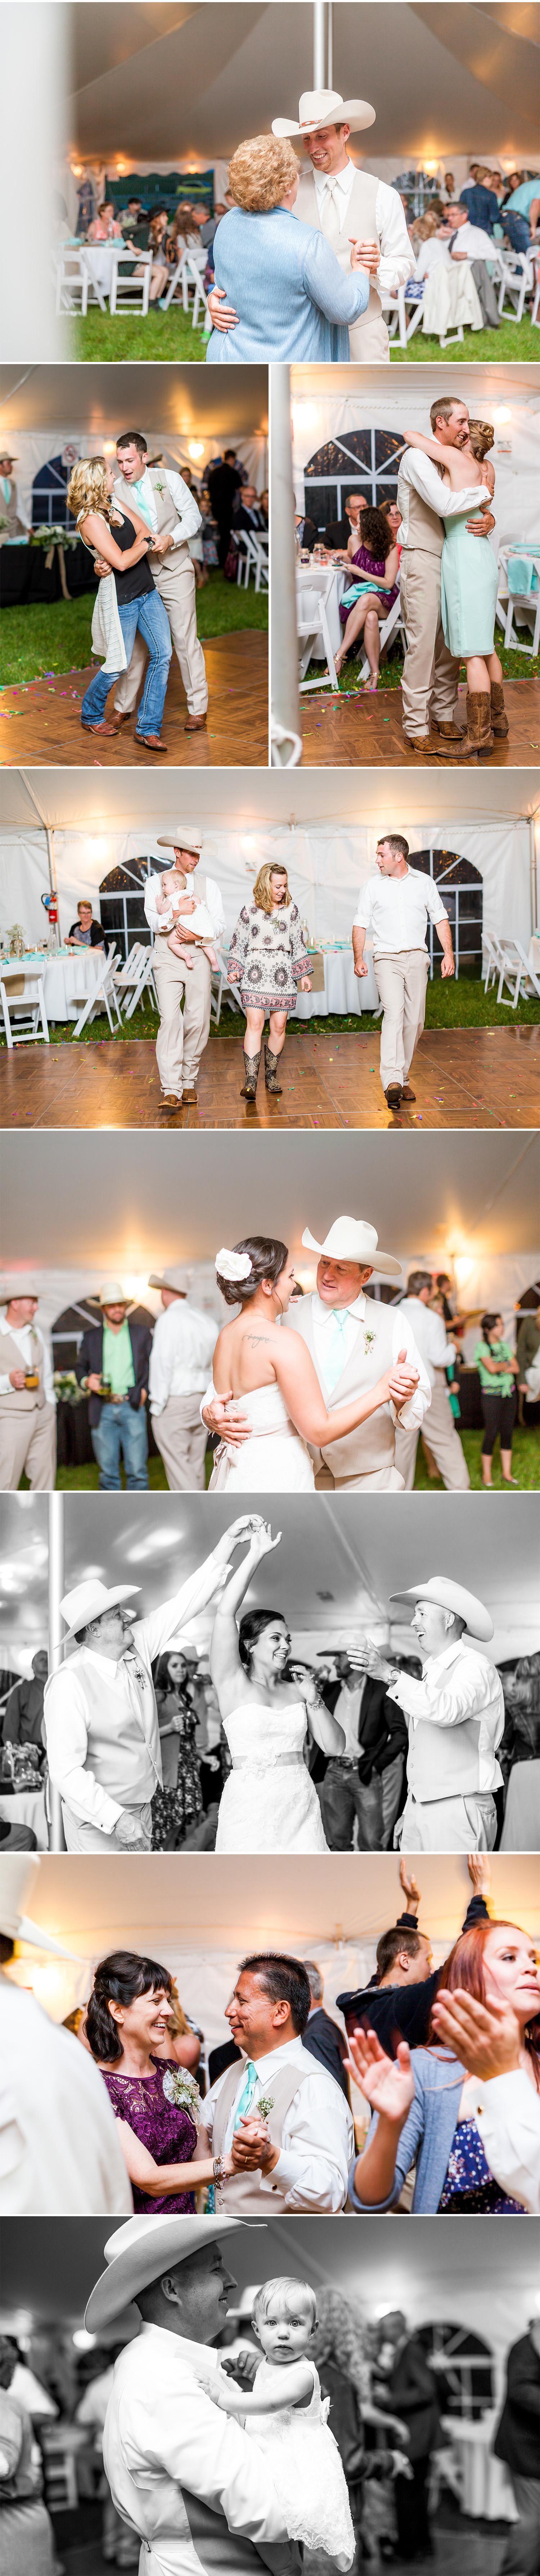 10_colorado wedding photography.jpg